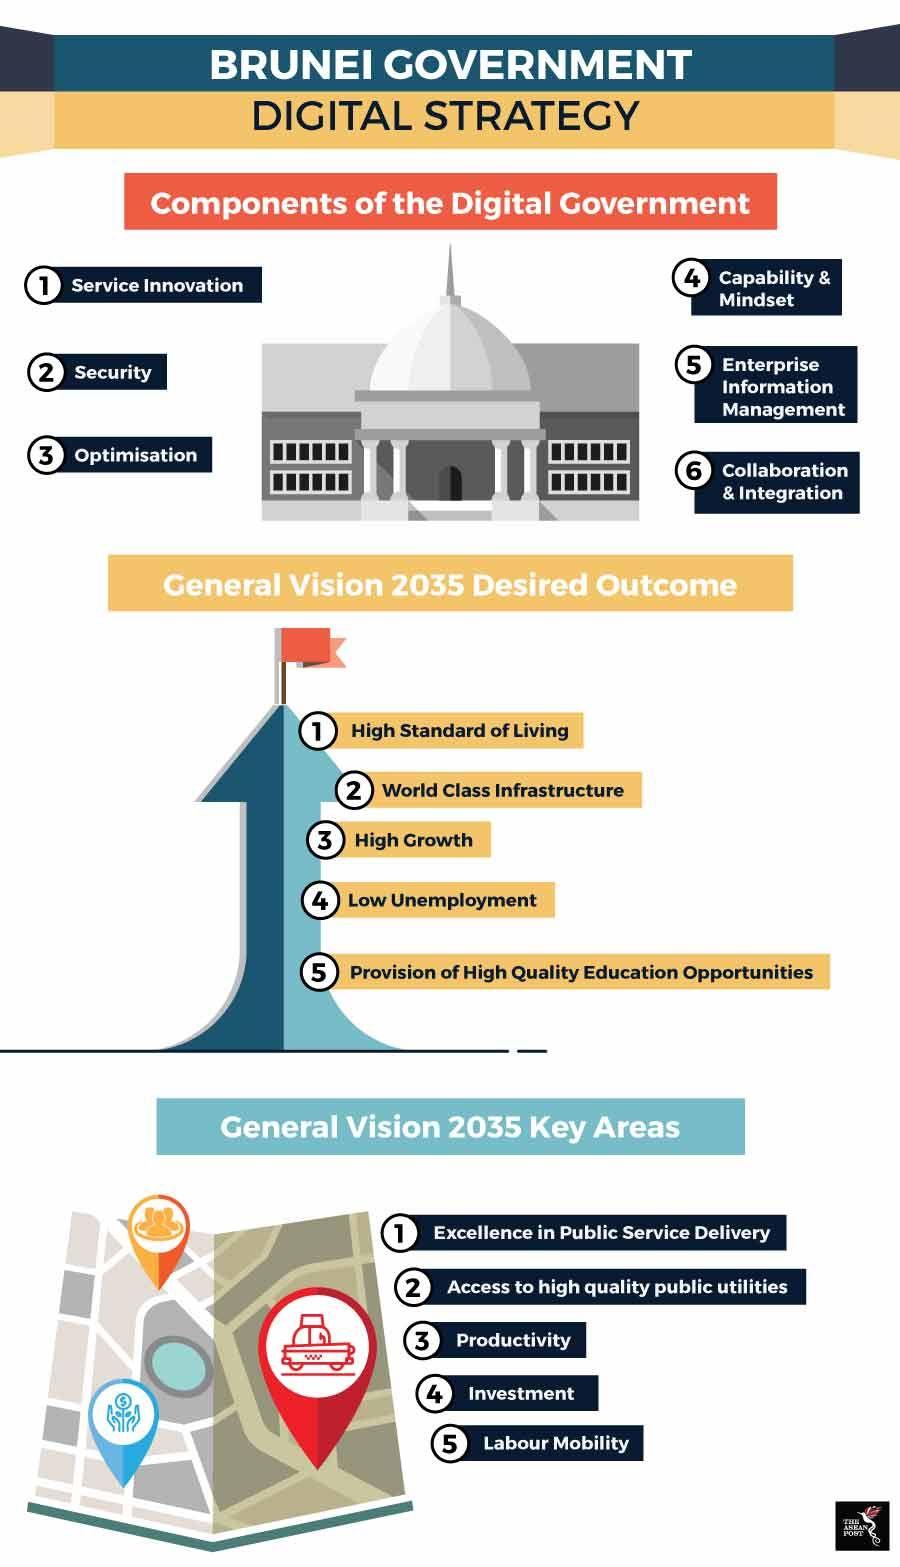 Digitalising Brunei Digital strategy, Government, Brunei